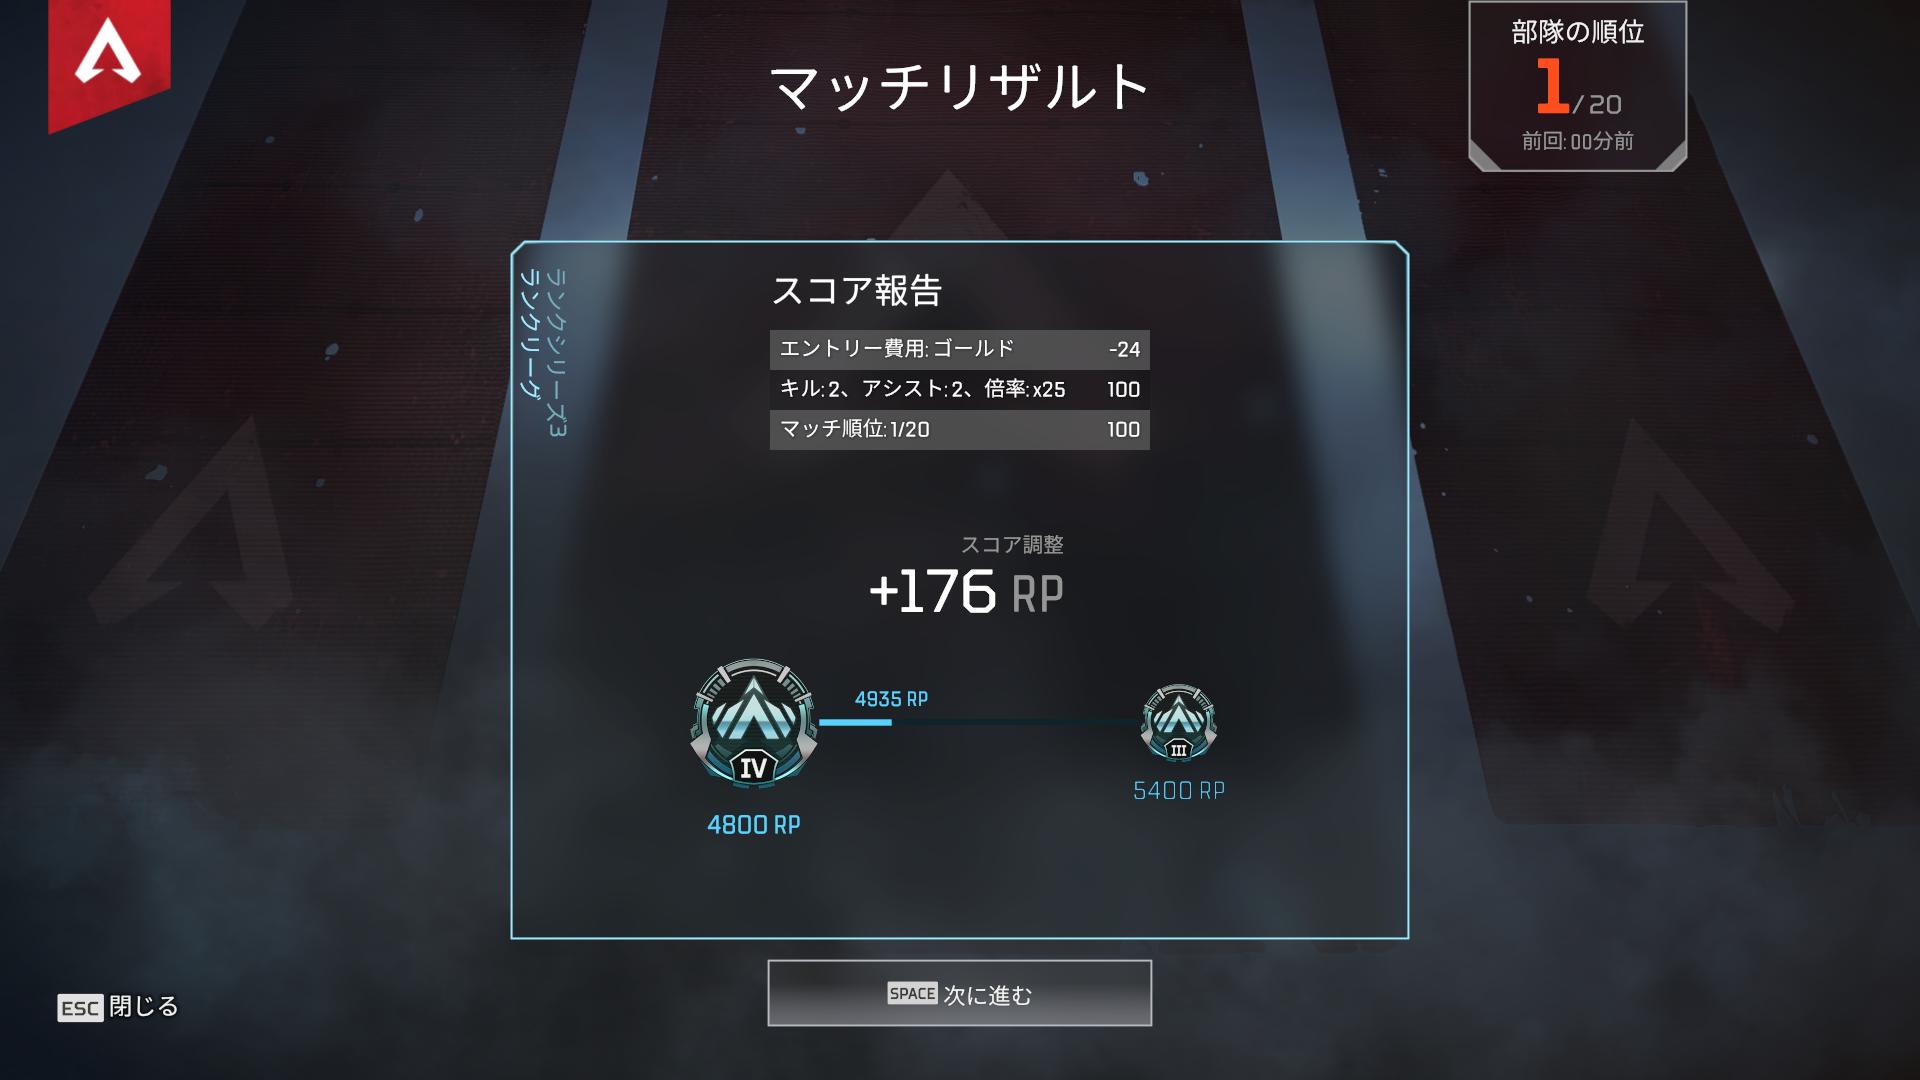 f:id:kyoumoe:20200319180455p:plain